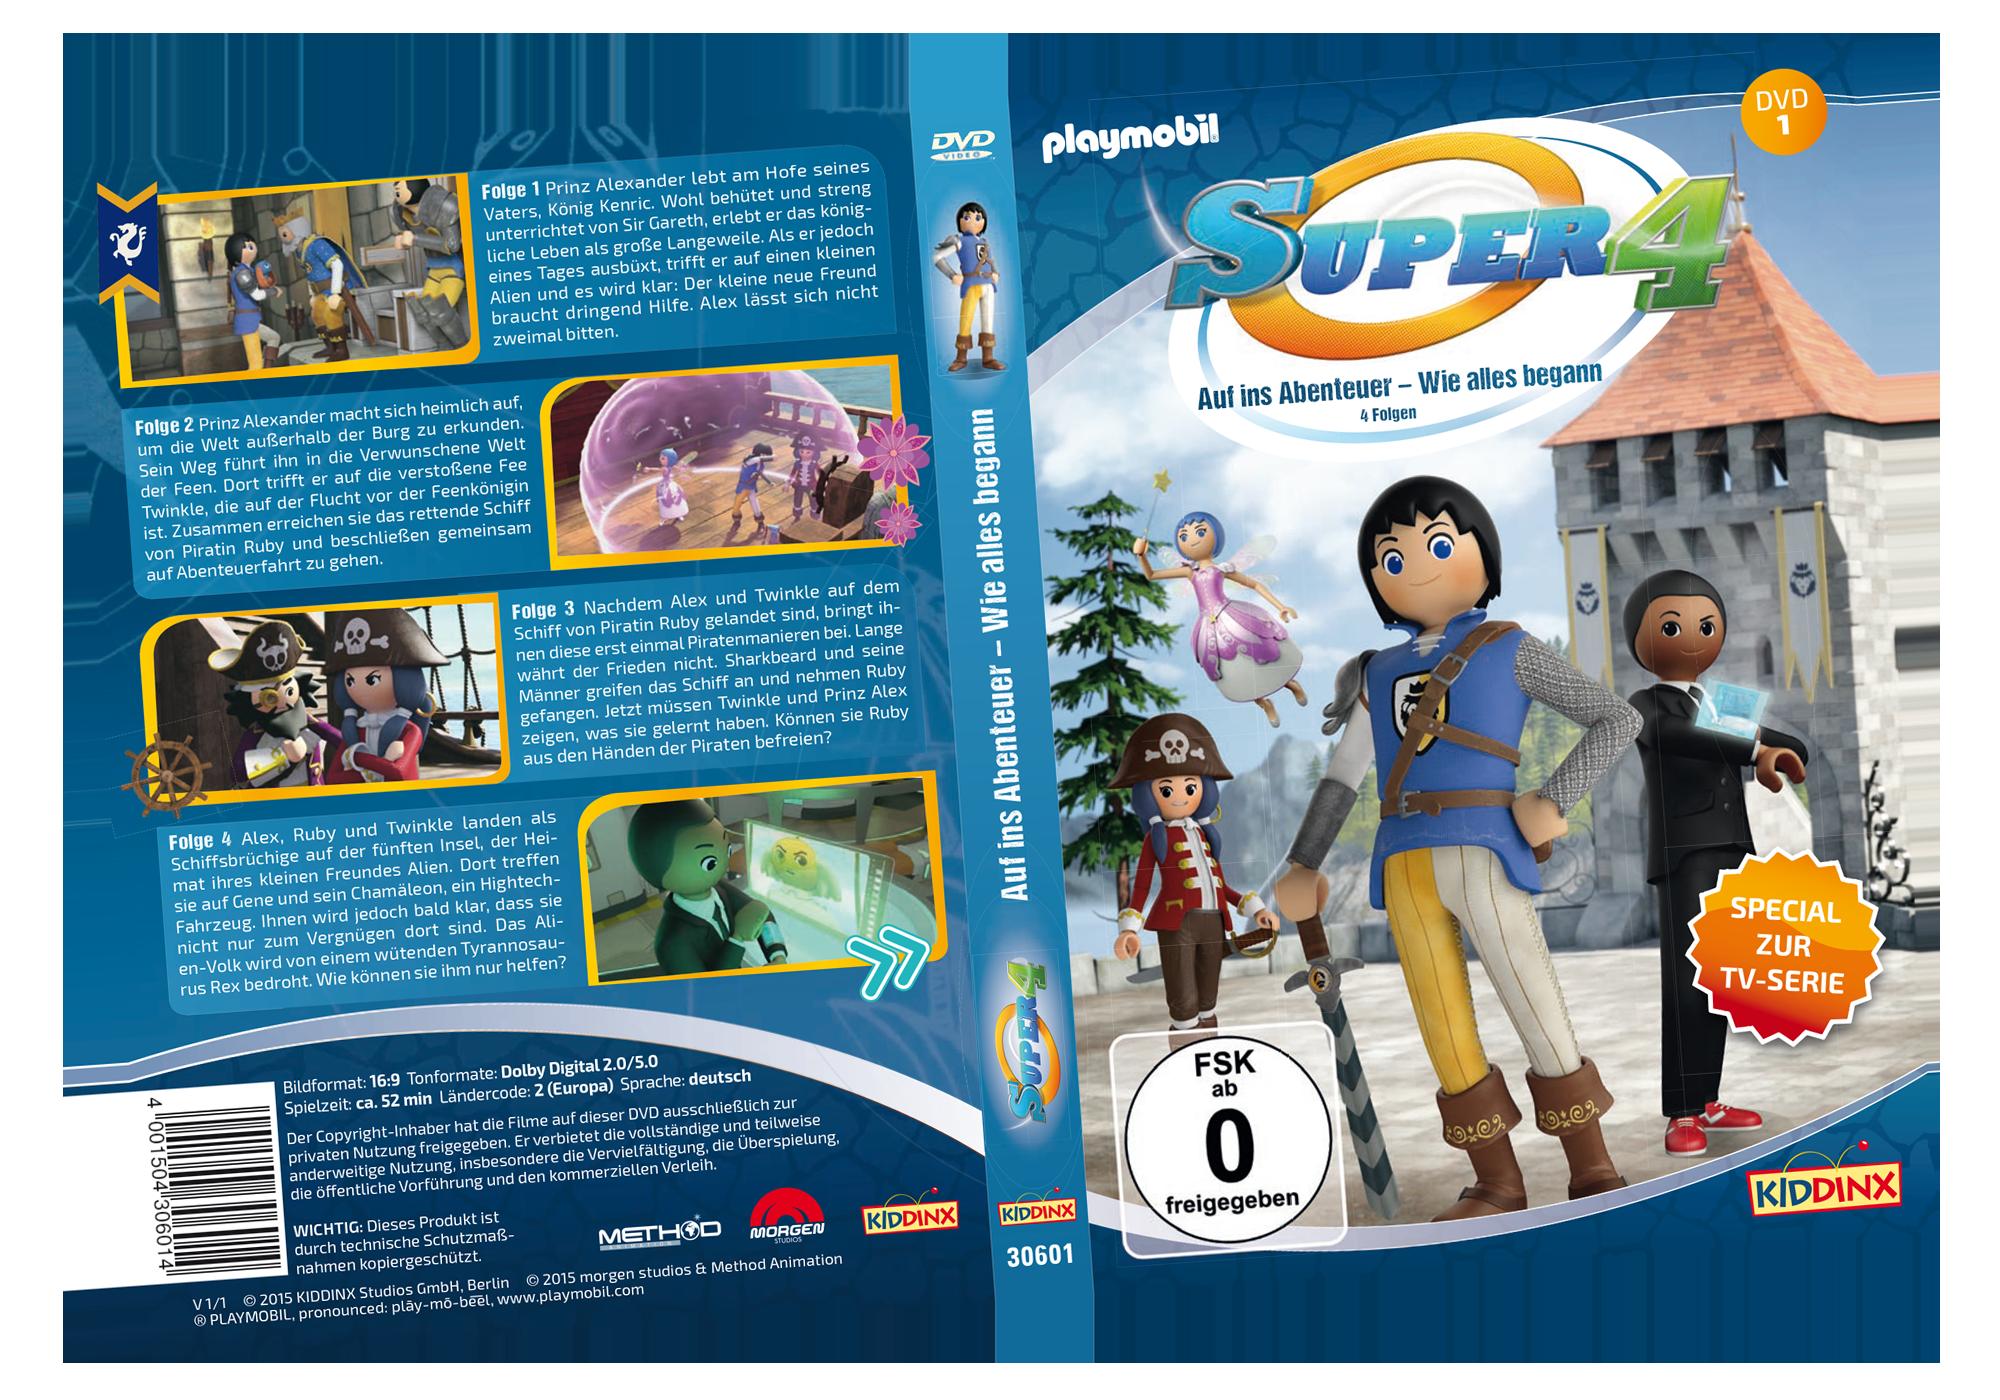 http://media.playmobil.com/i/playmobil/80476_product_detail/DVD 1 Super4: Auf ins Abenteuer - Wie alles begann